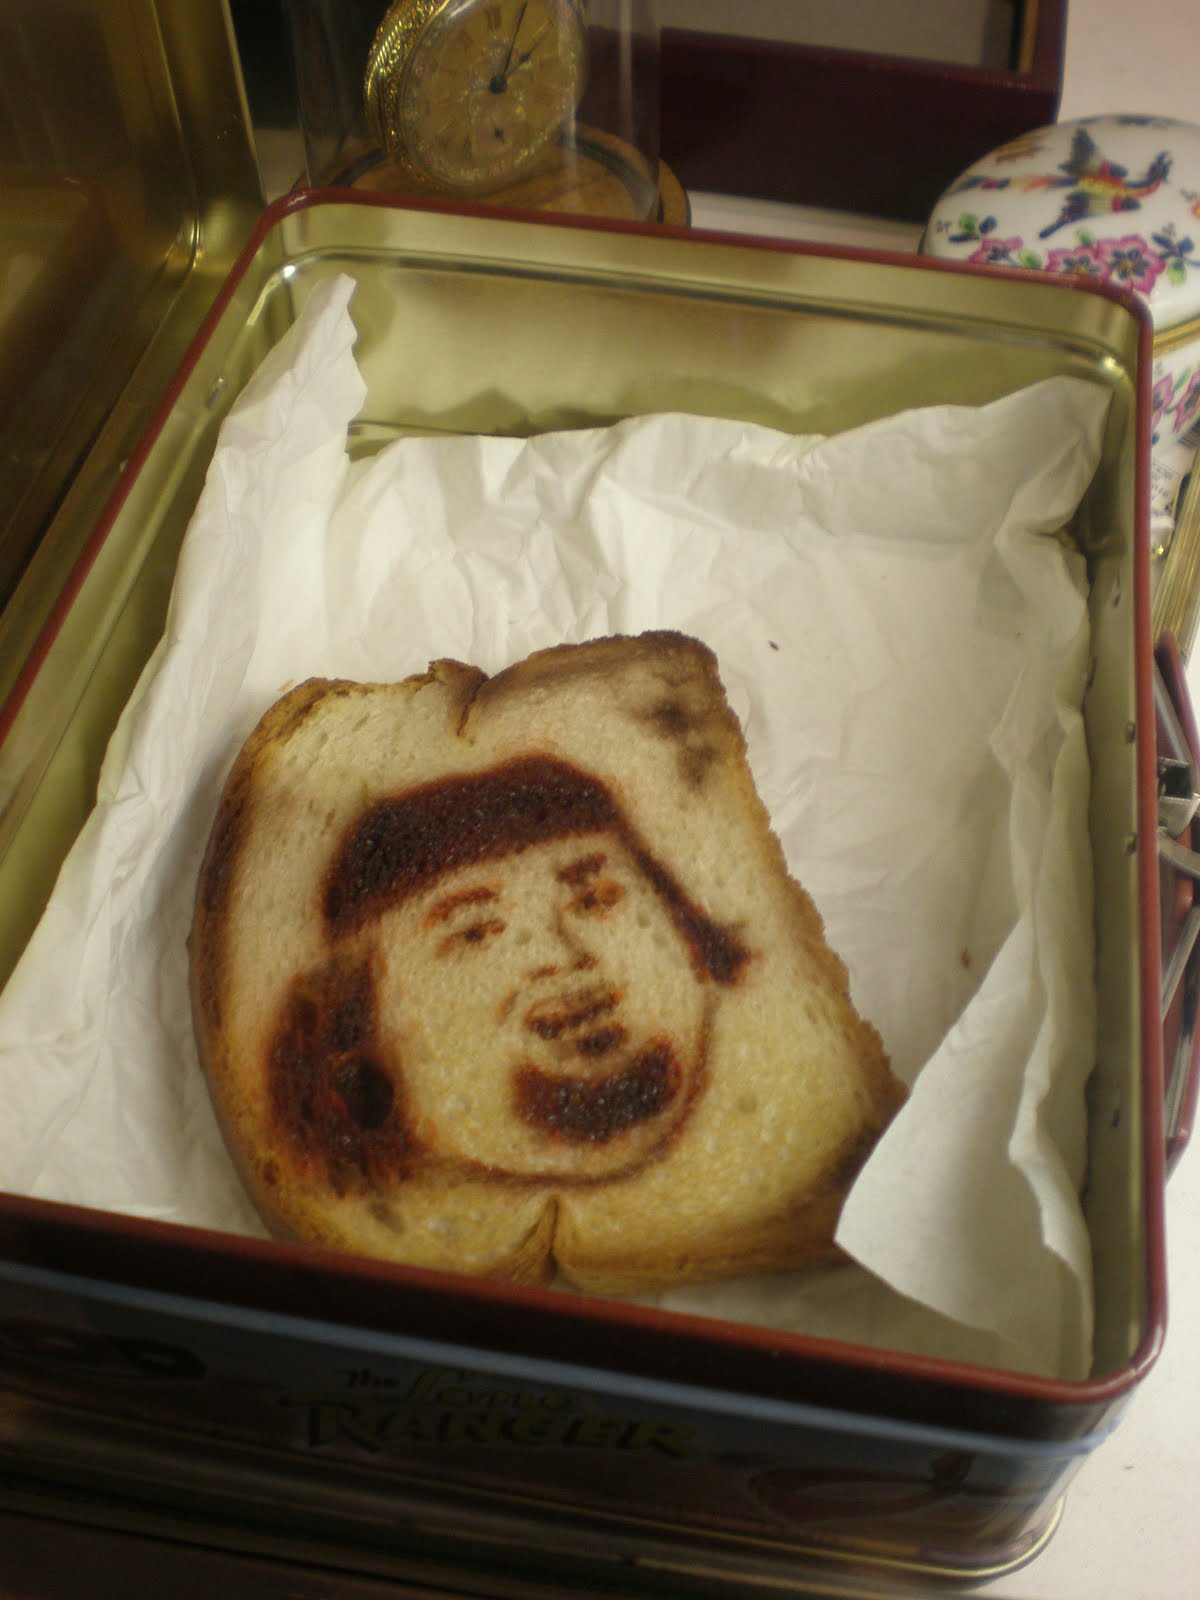 Burnt toast that looks like Chumley.